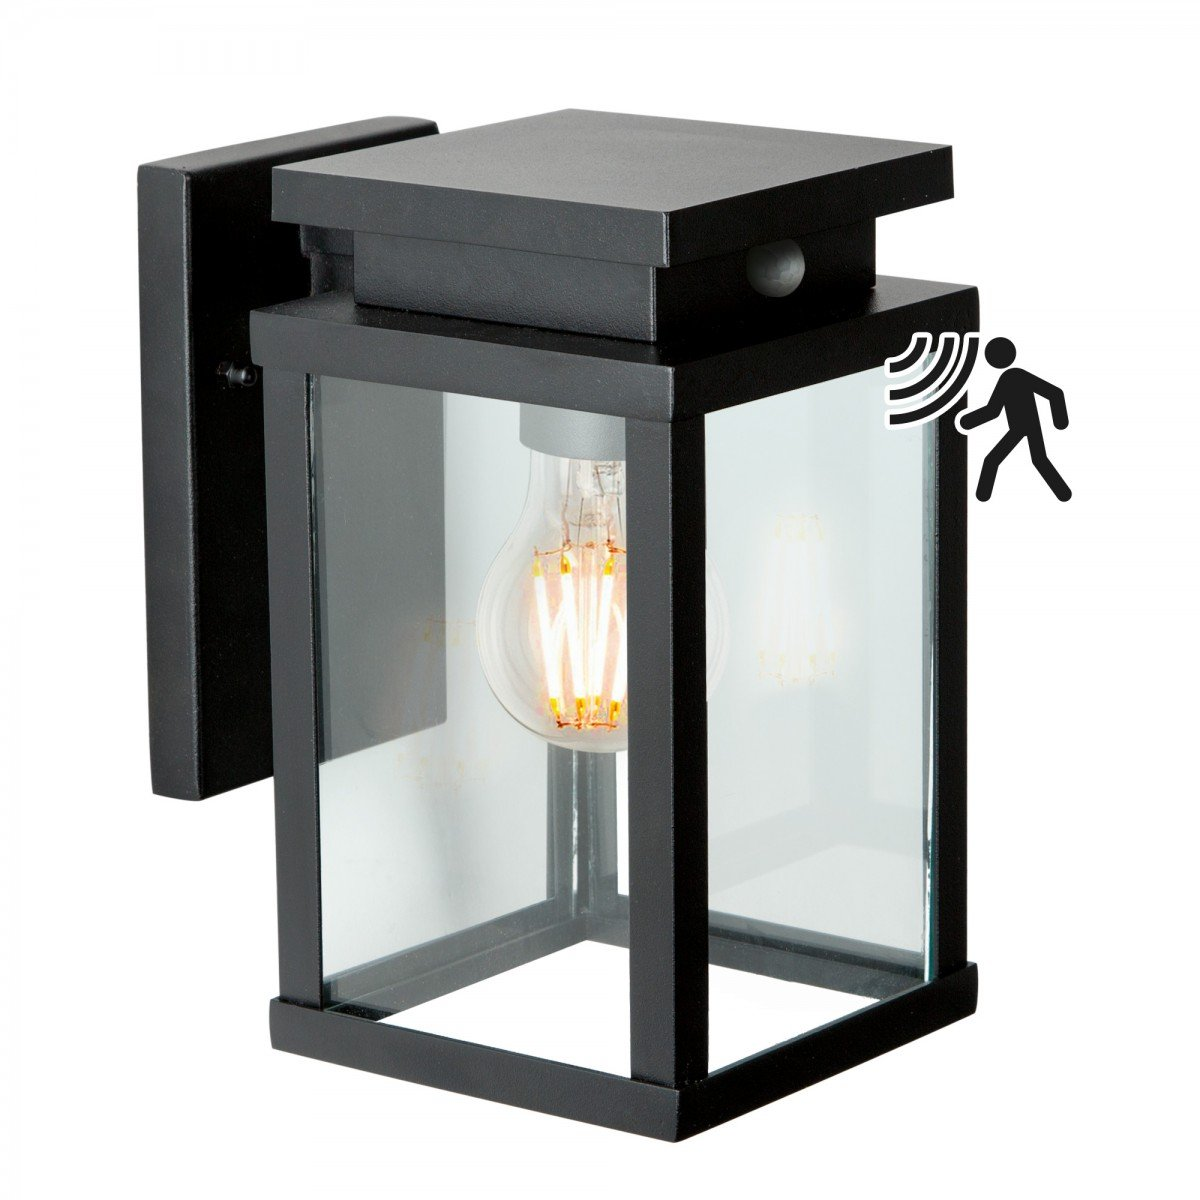 KS Verlichting Jersey M Wandlamp + Bewegingssensor